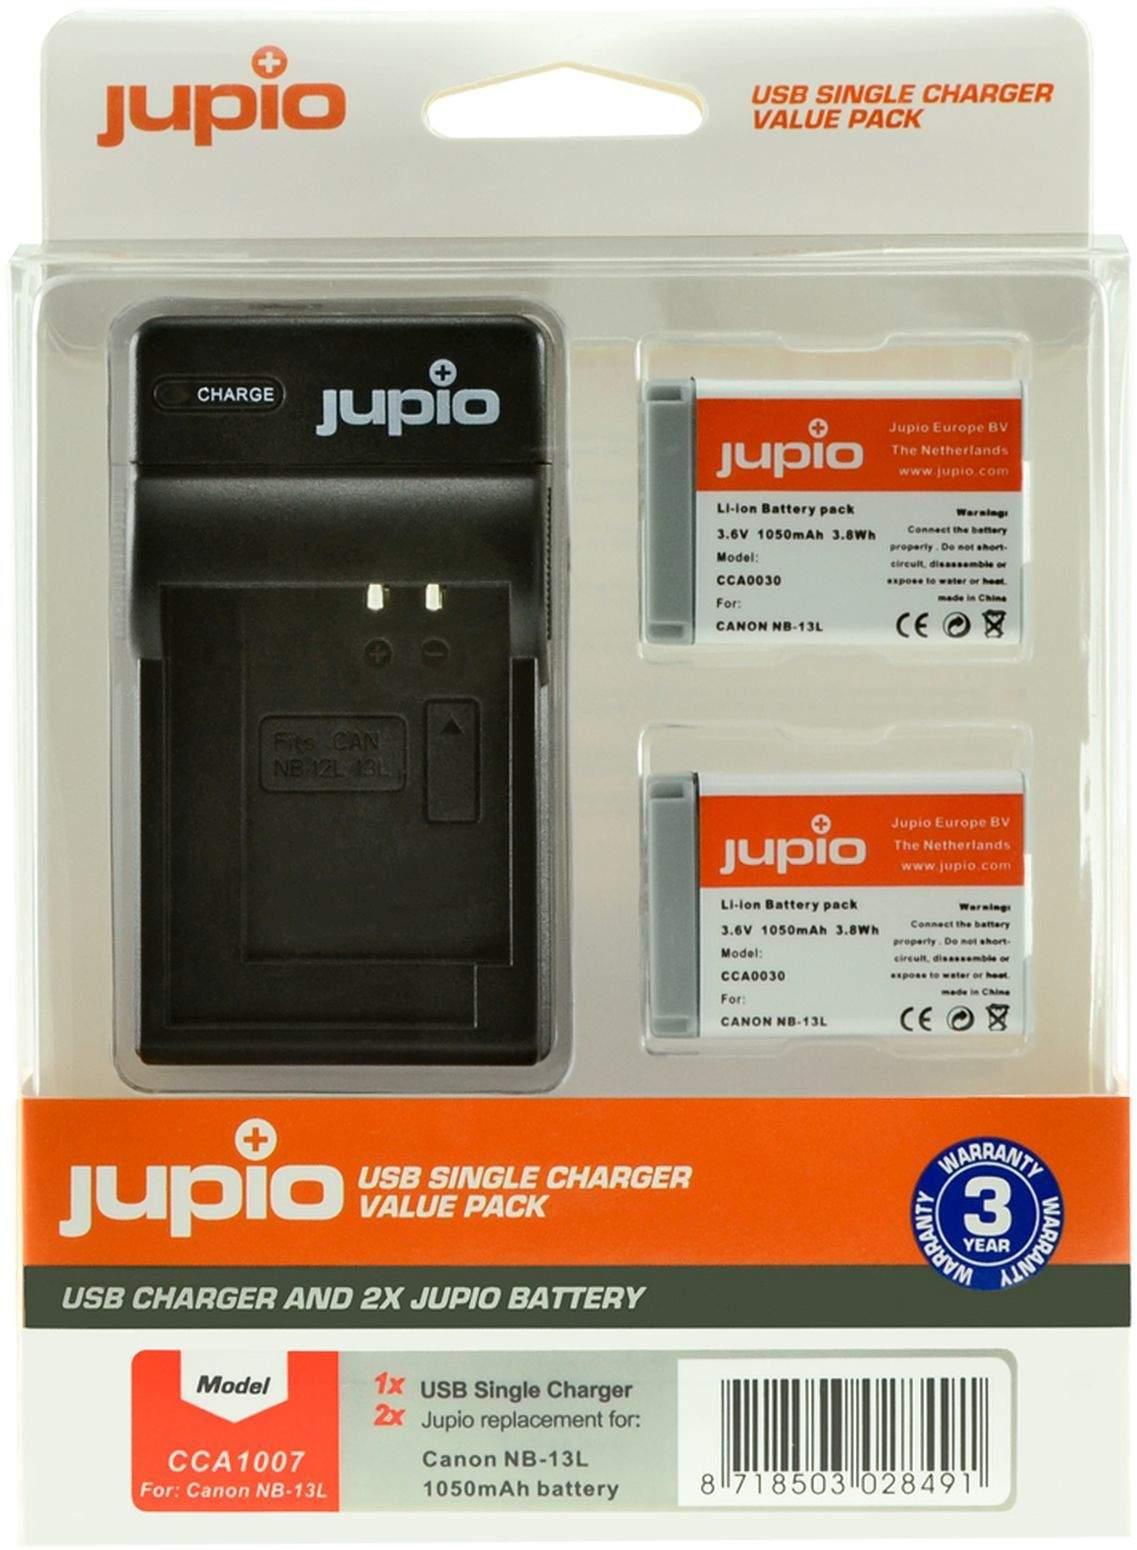 2 x Jupio Canon NB-13 Batteries & Single Charger Kit main image